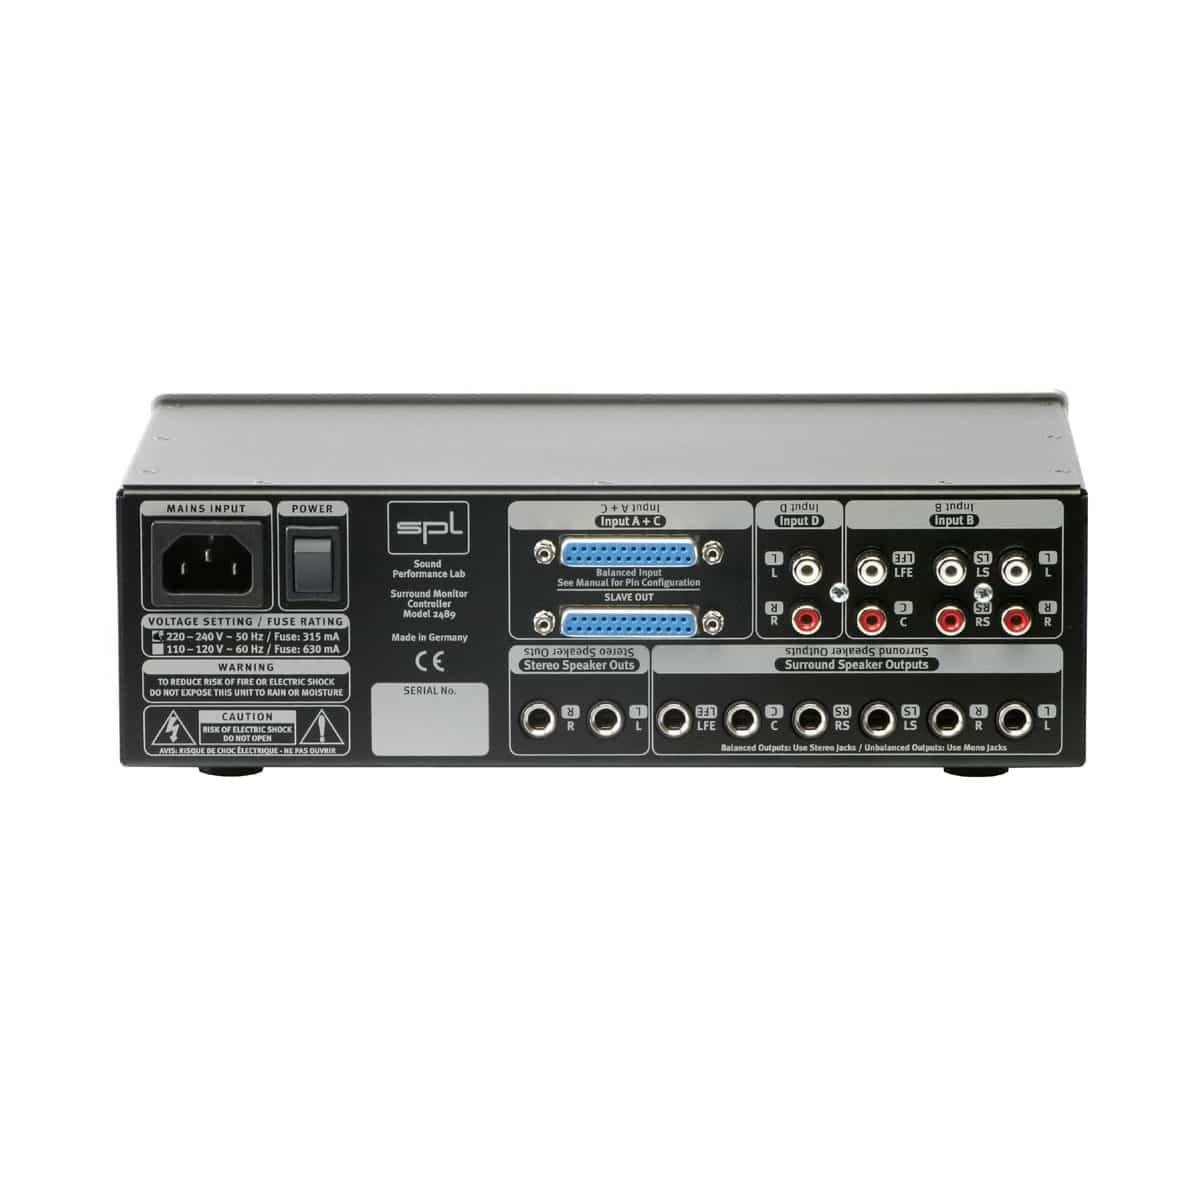 SPL SMC Pro Audio, Audio Monitors, Control Room SPL SMC 02